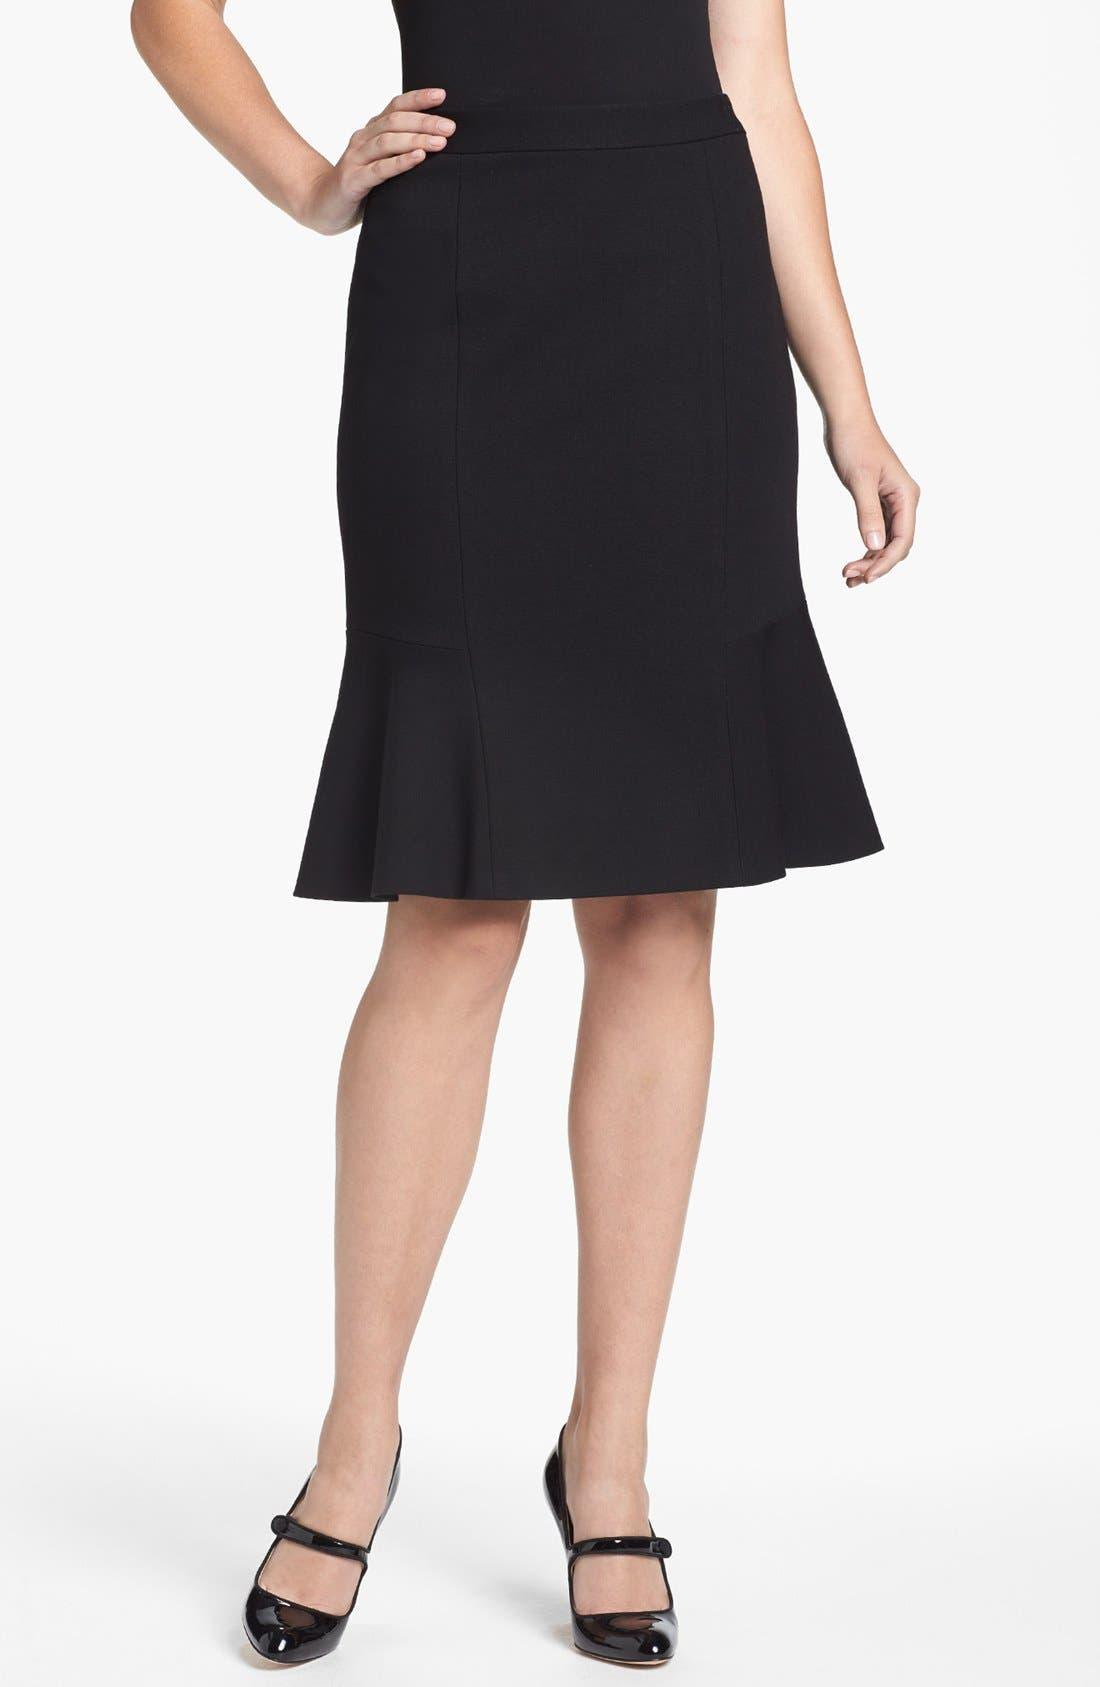 Alternate Image 1 Selected - Classiques Entier® Ruffled Italian Ponte Skirt